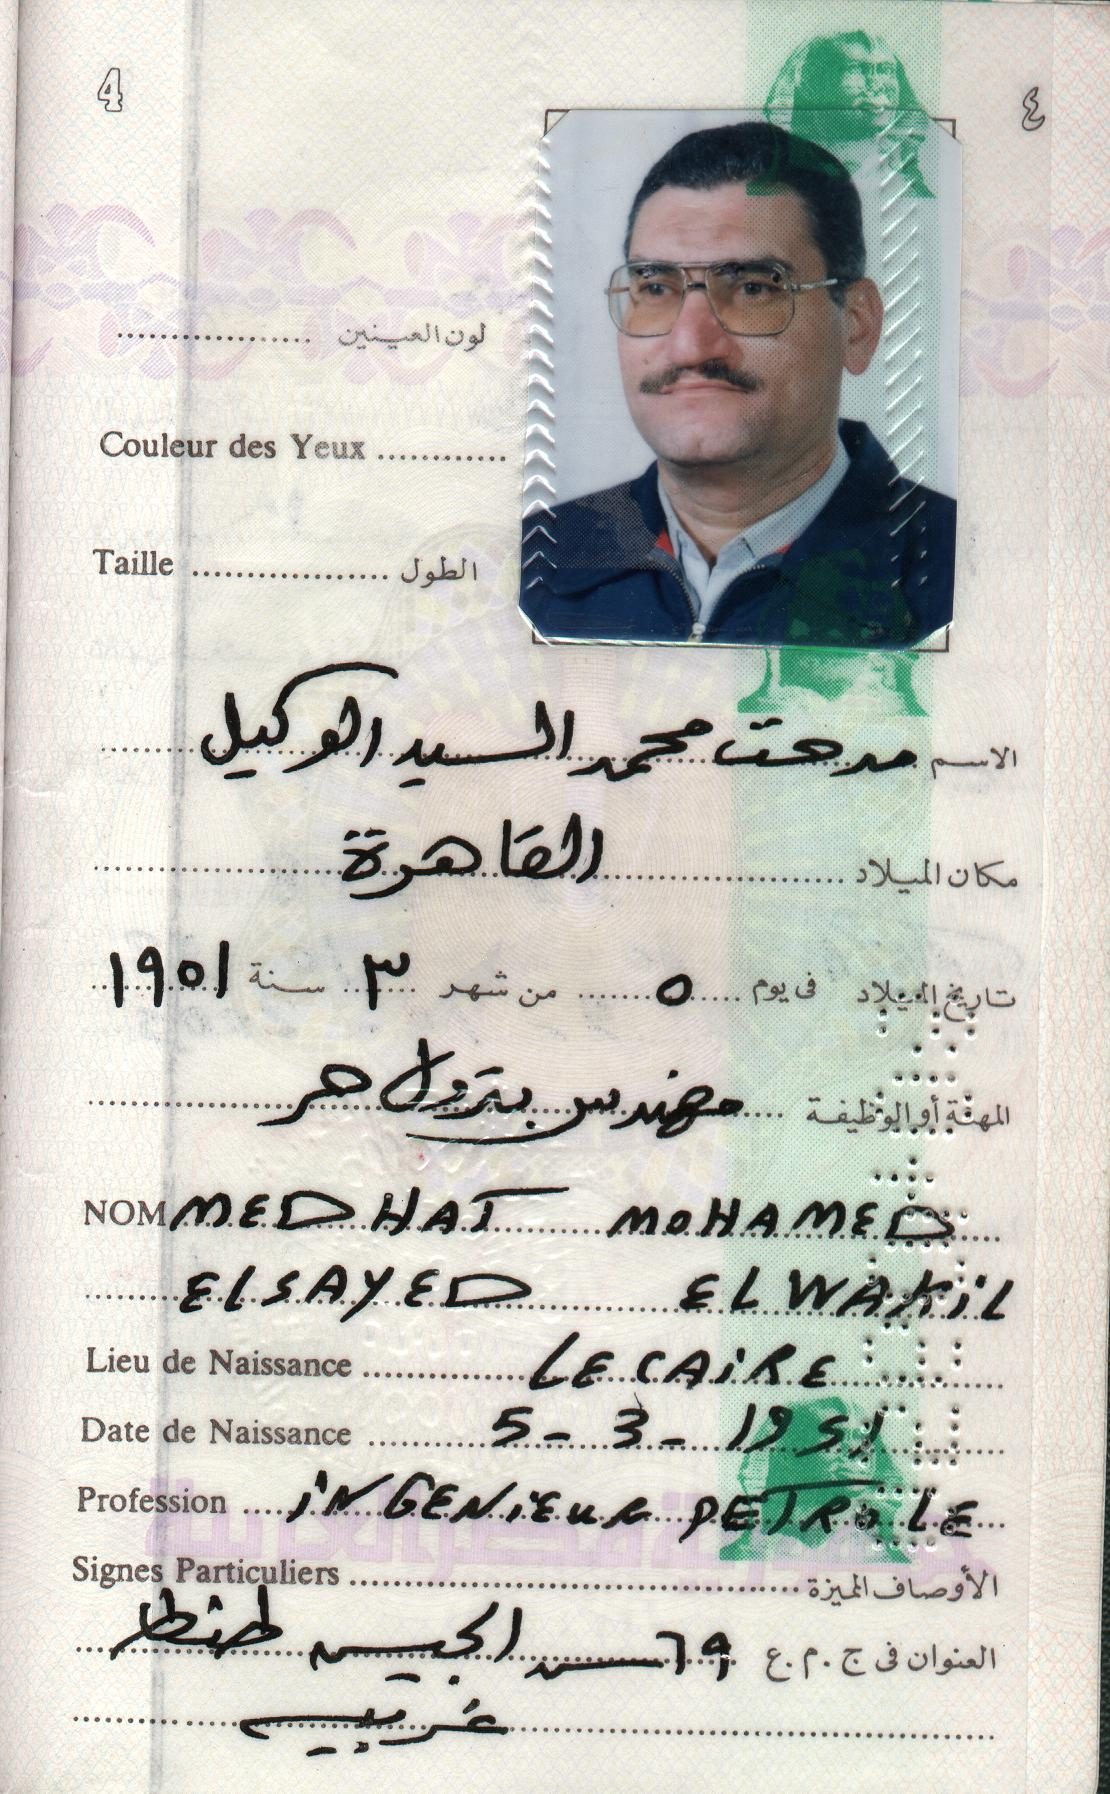 hotmail passport com: